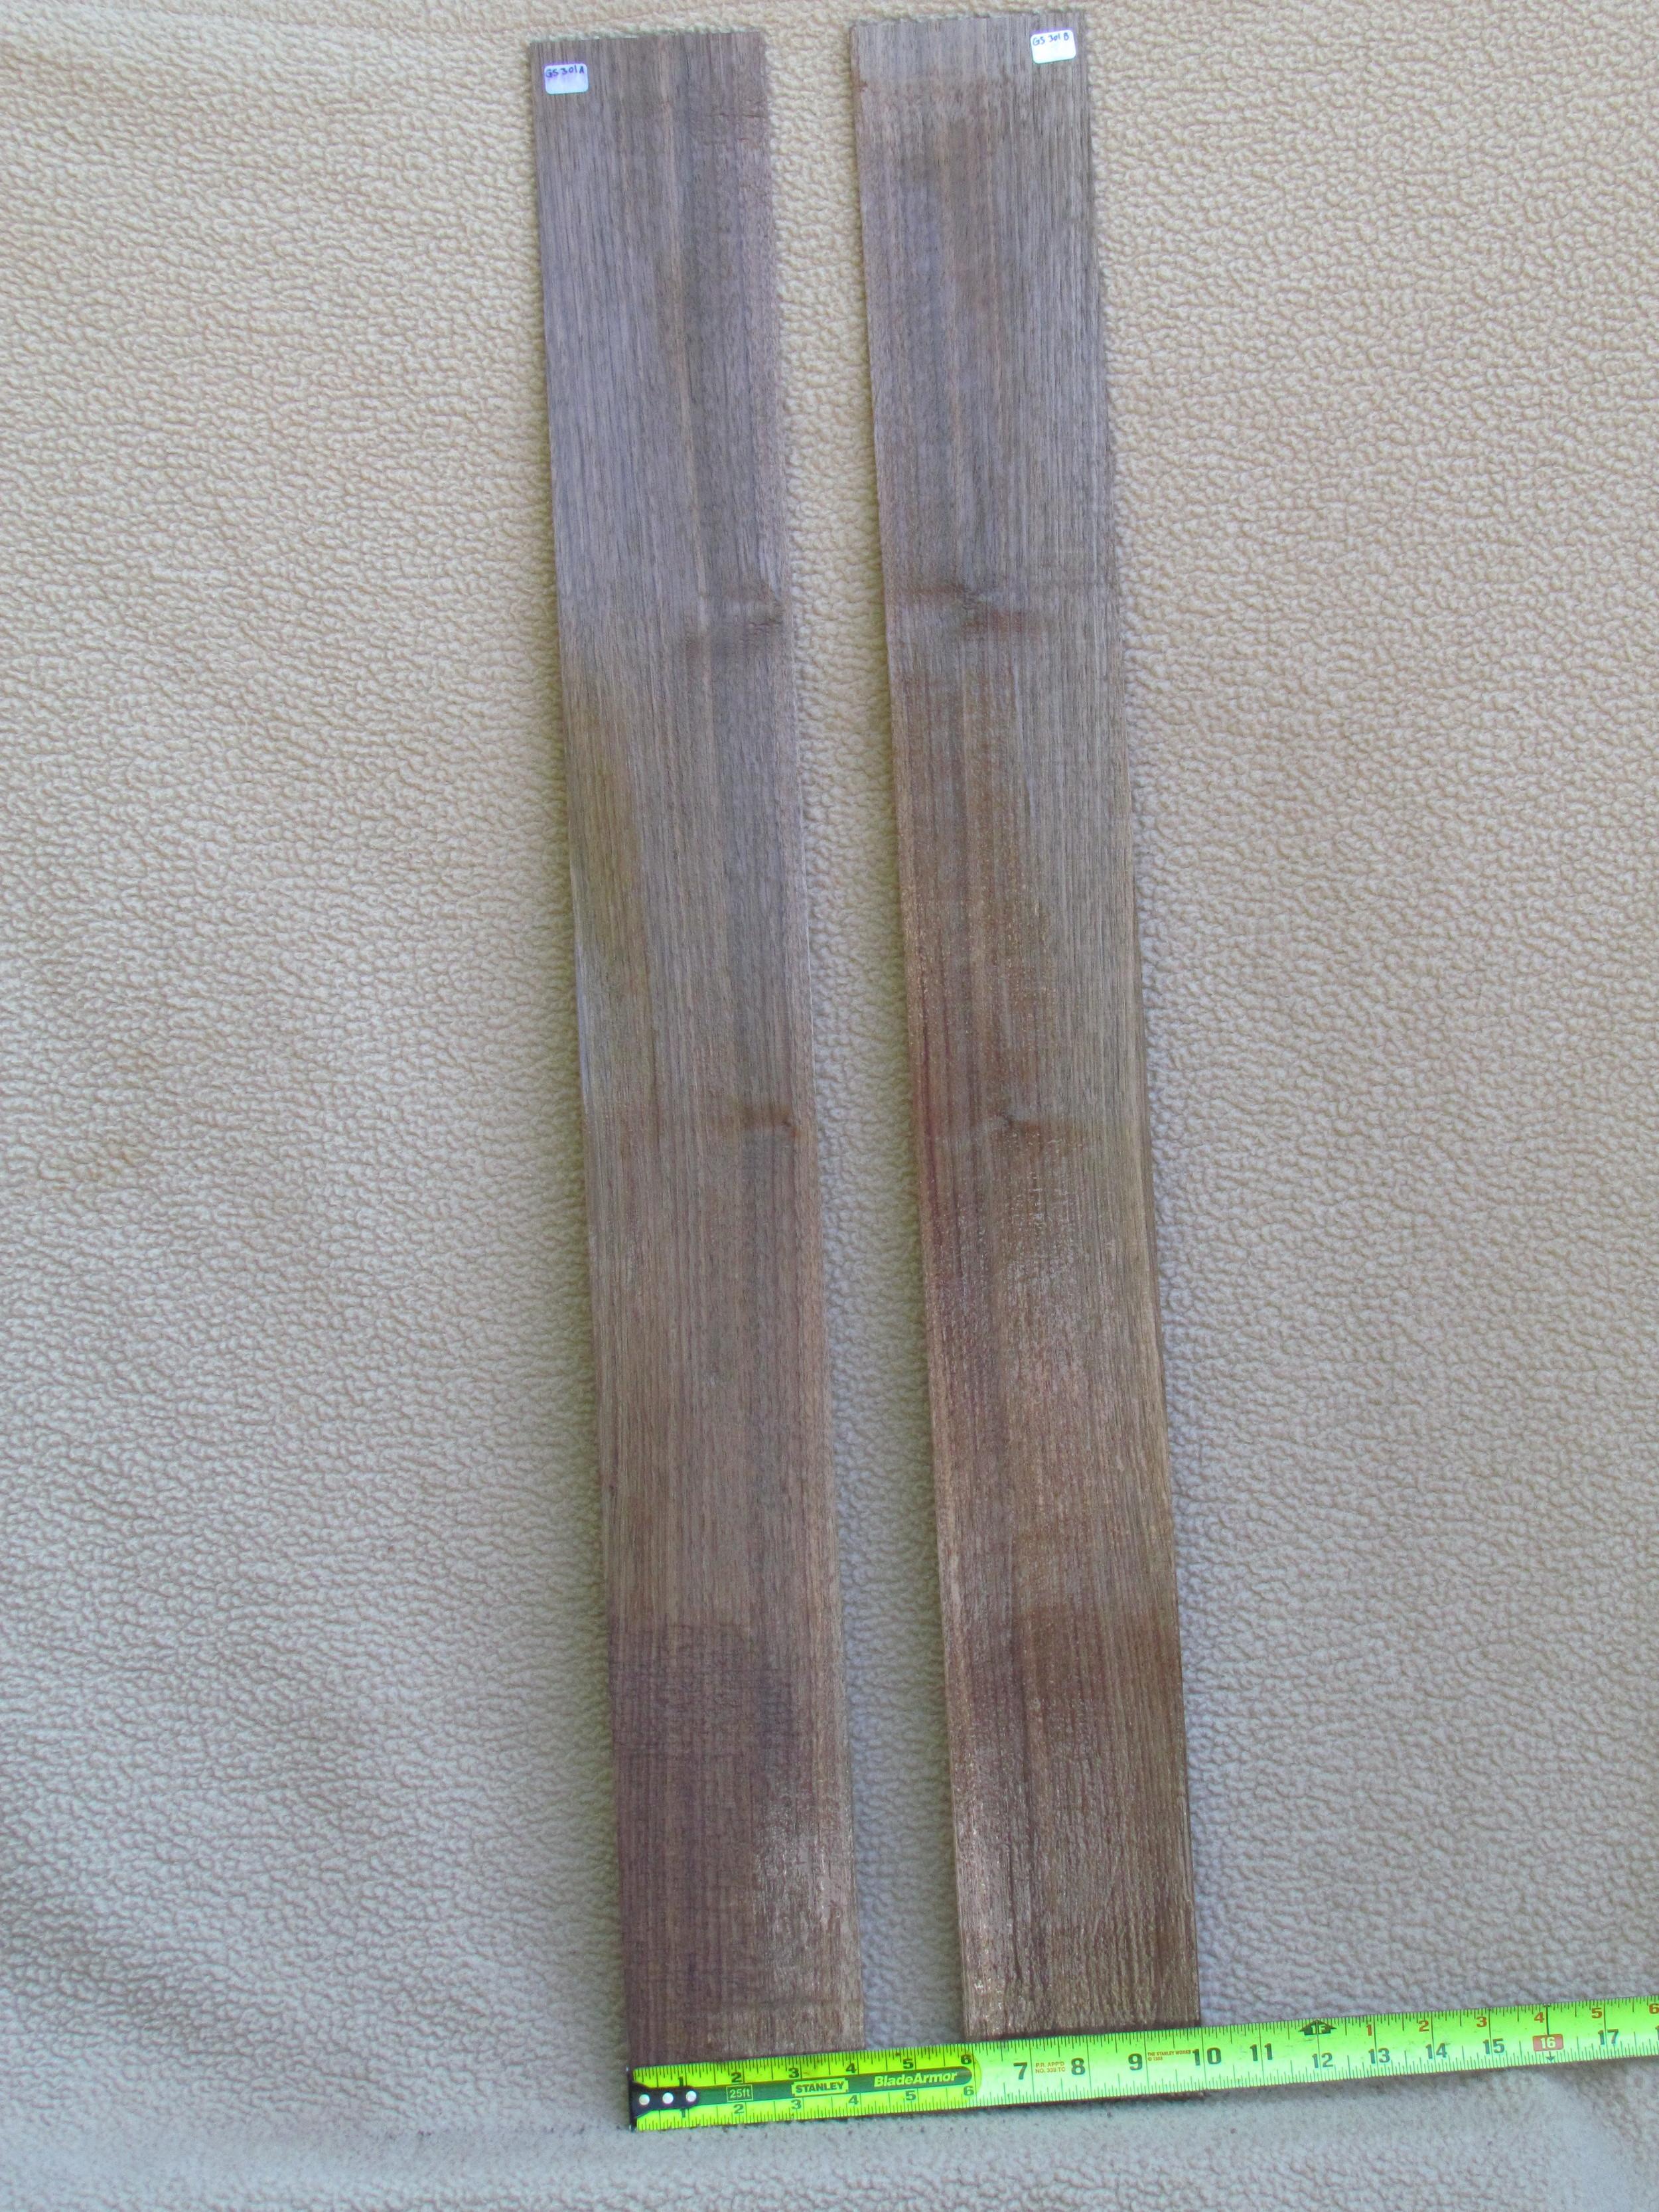 Eastern Black Walnut